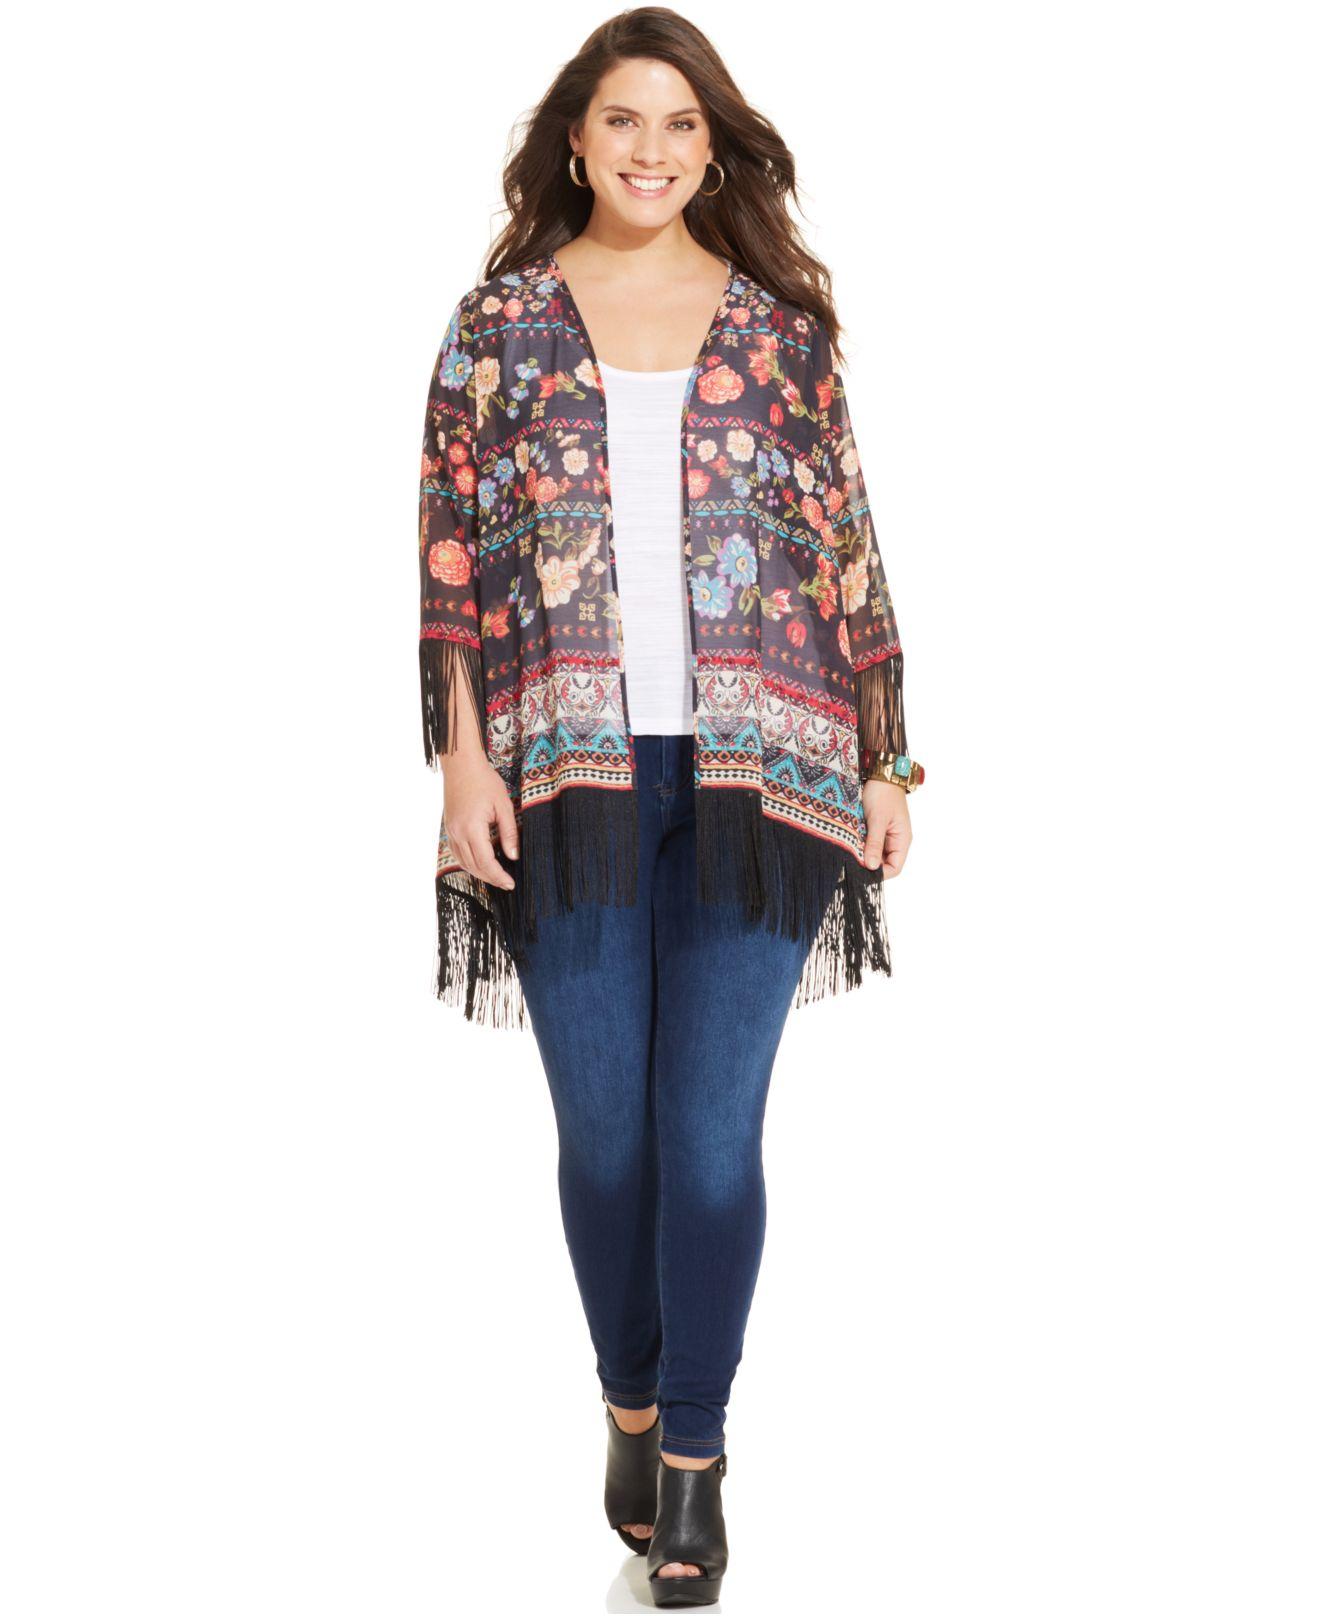 American rag Plus Size Floral-Print Kimono Cardigan in Black | Lyst